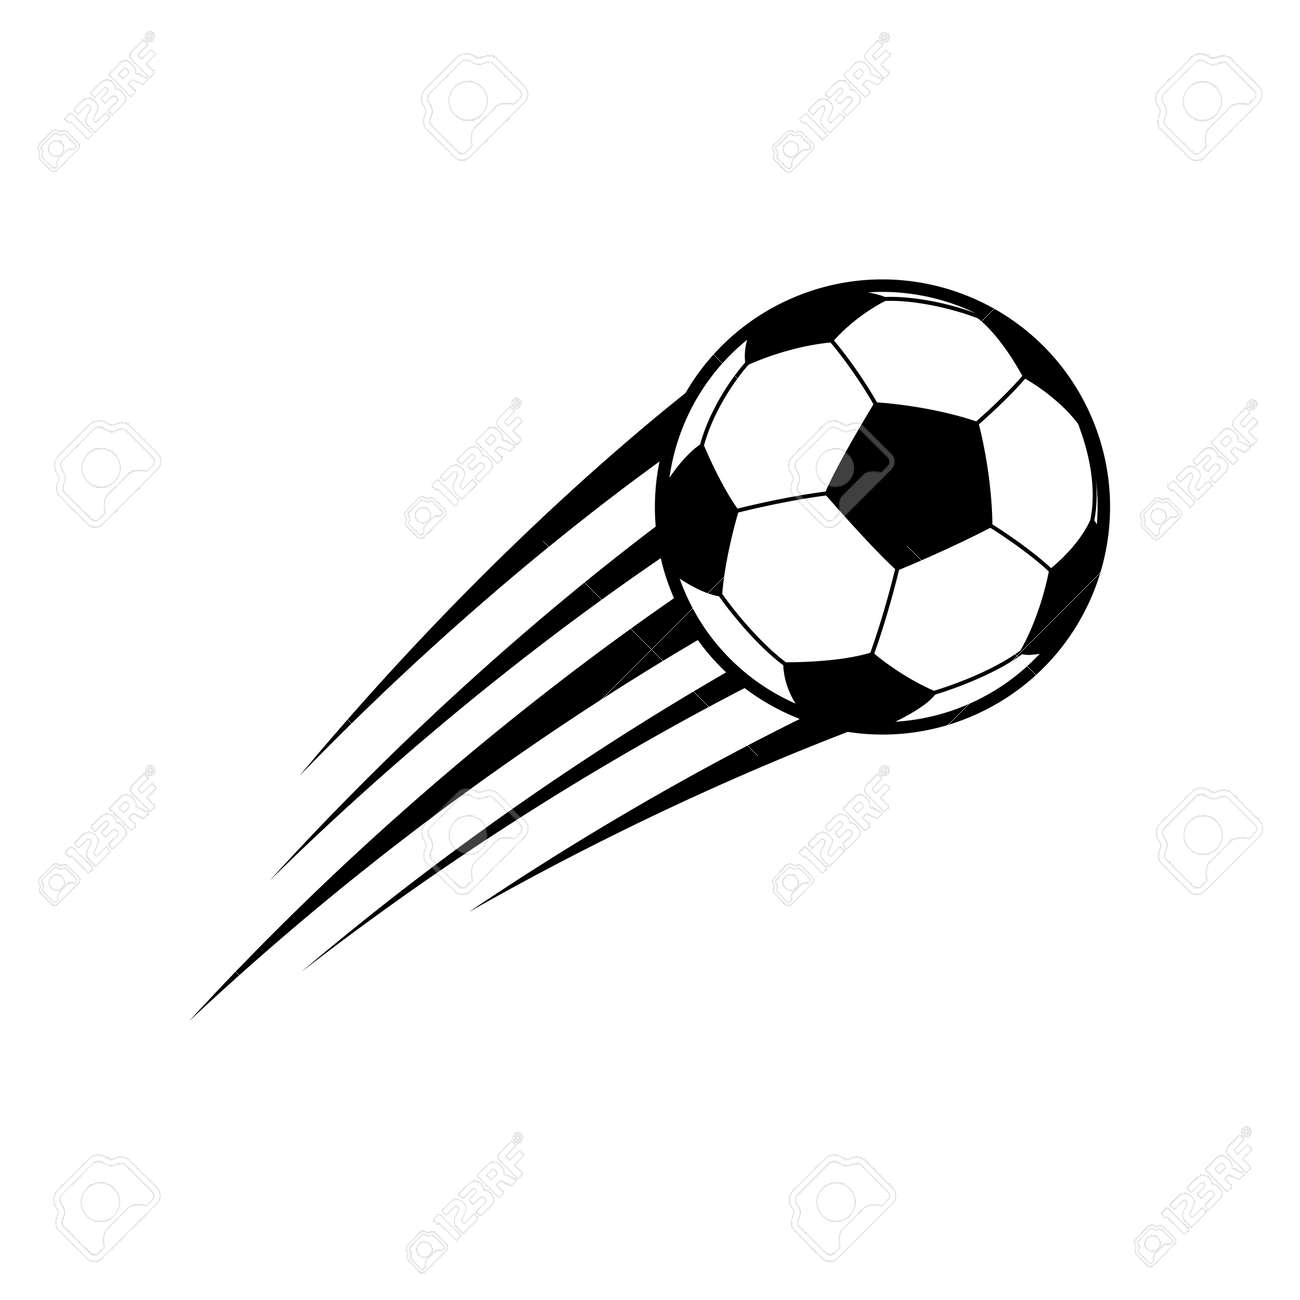 Flying soccer ball. Vector - 99331972